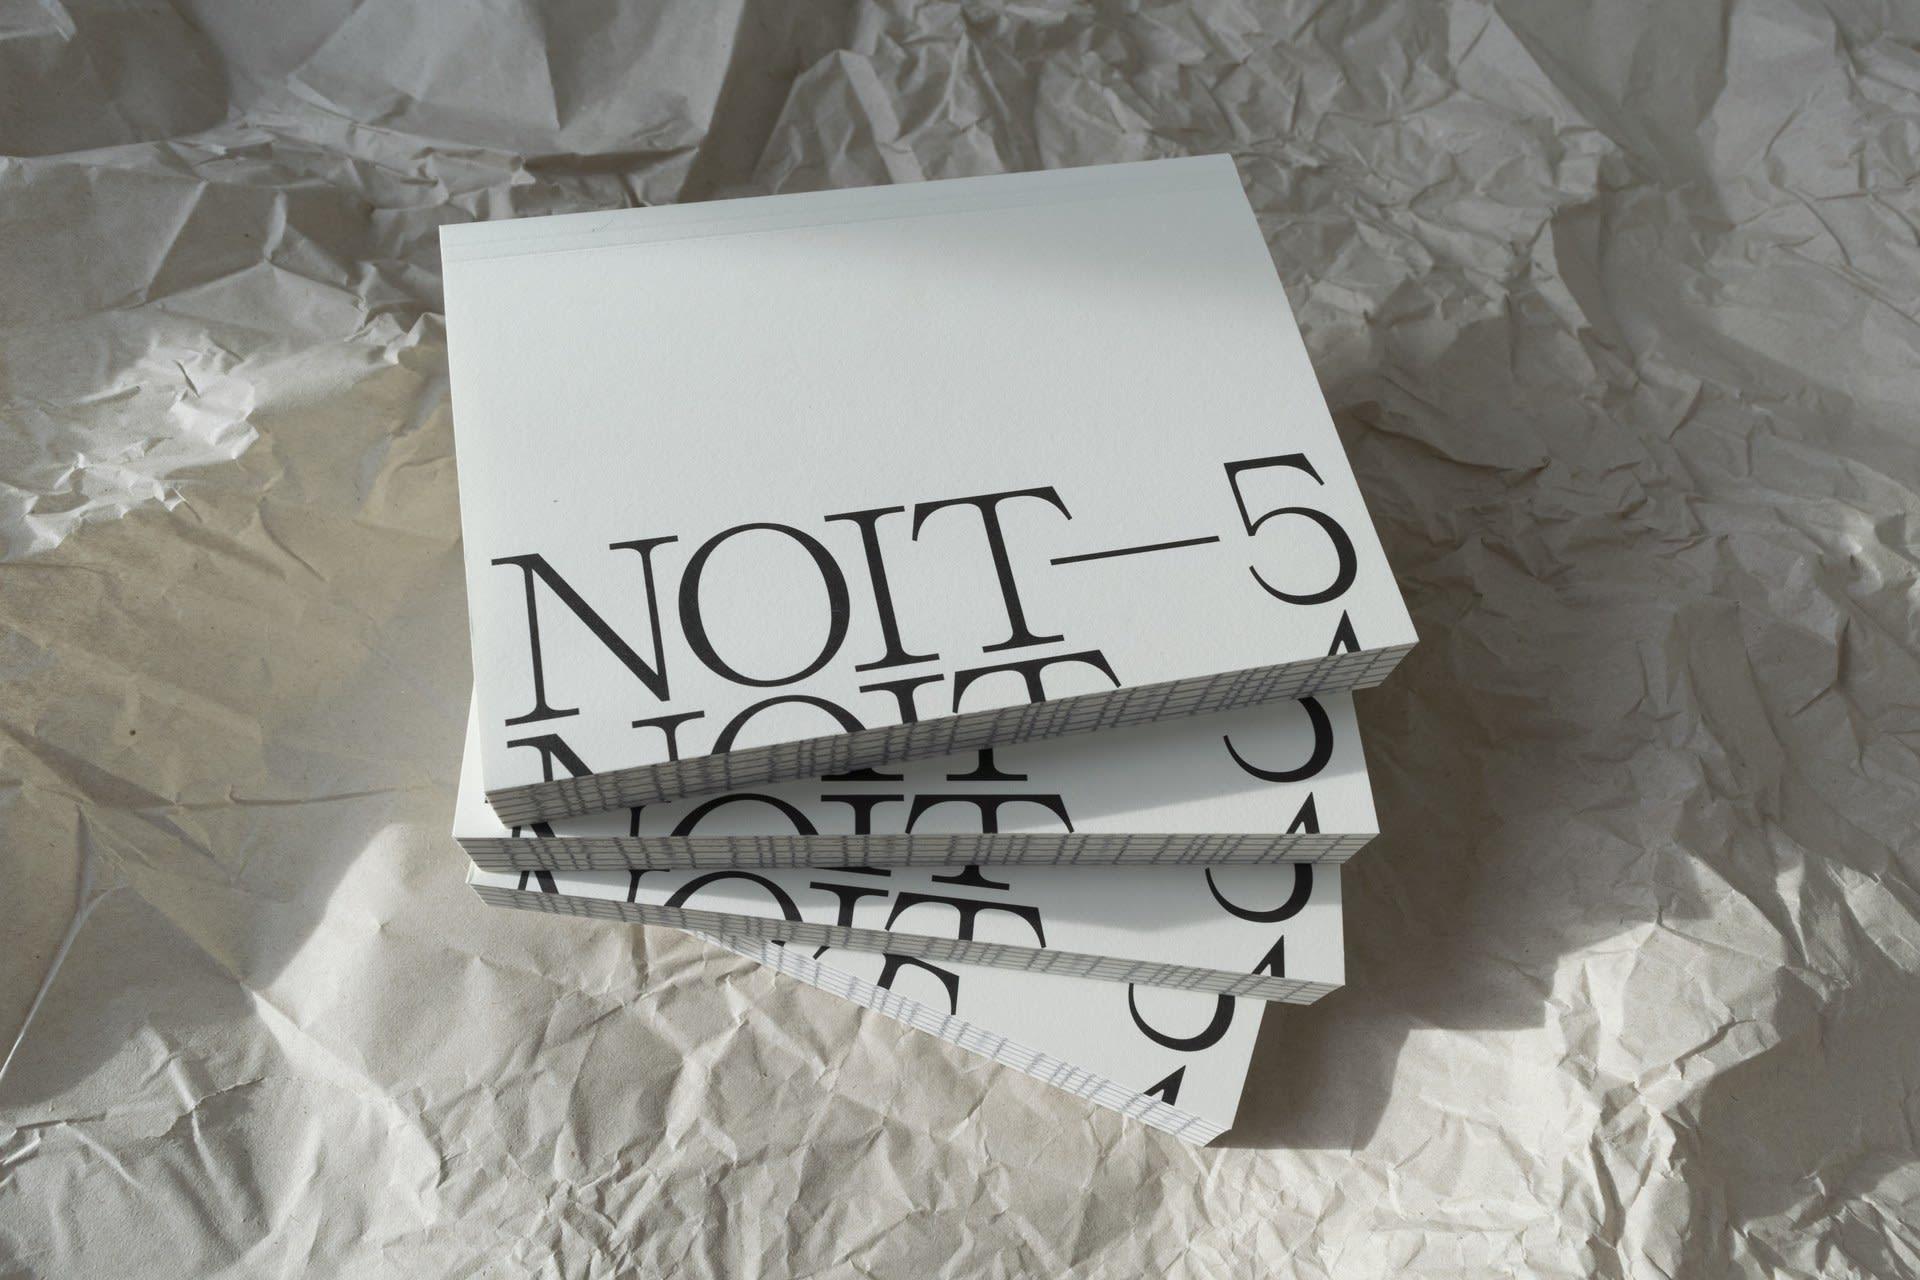 NOIT—5: bodies as in buildings